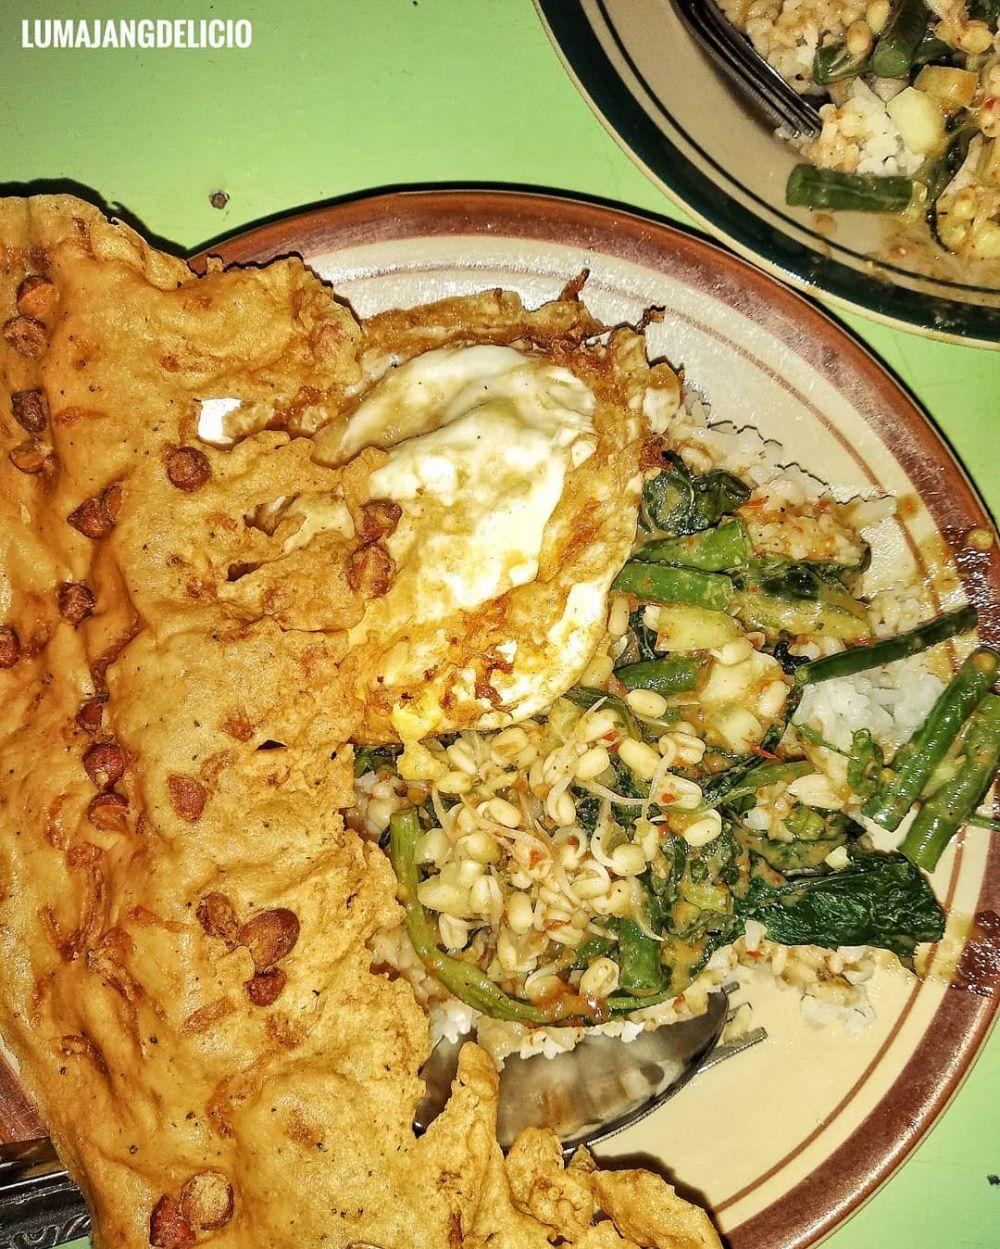 10 Kuliner khas Lumajang, dijamin bikin nagih berbagai sumber